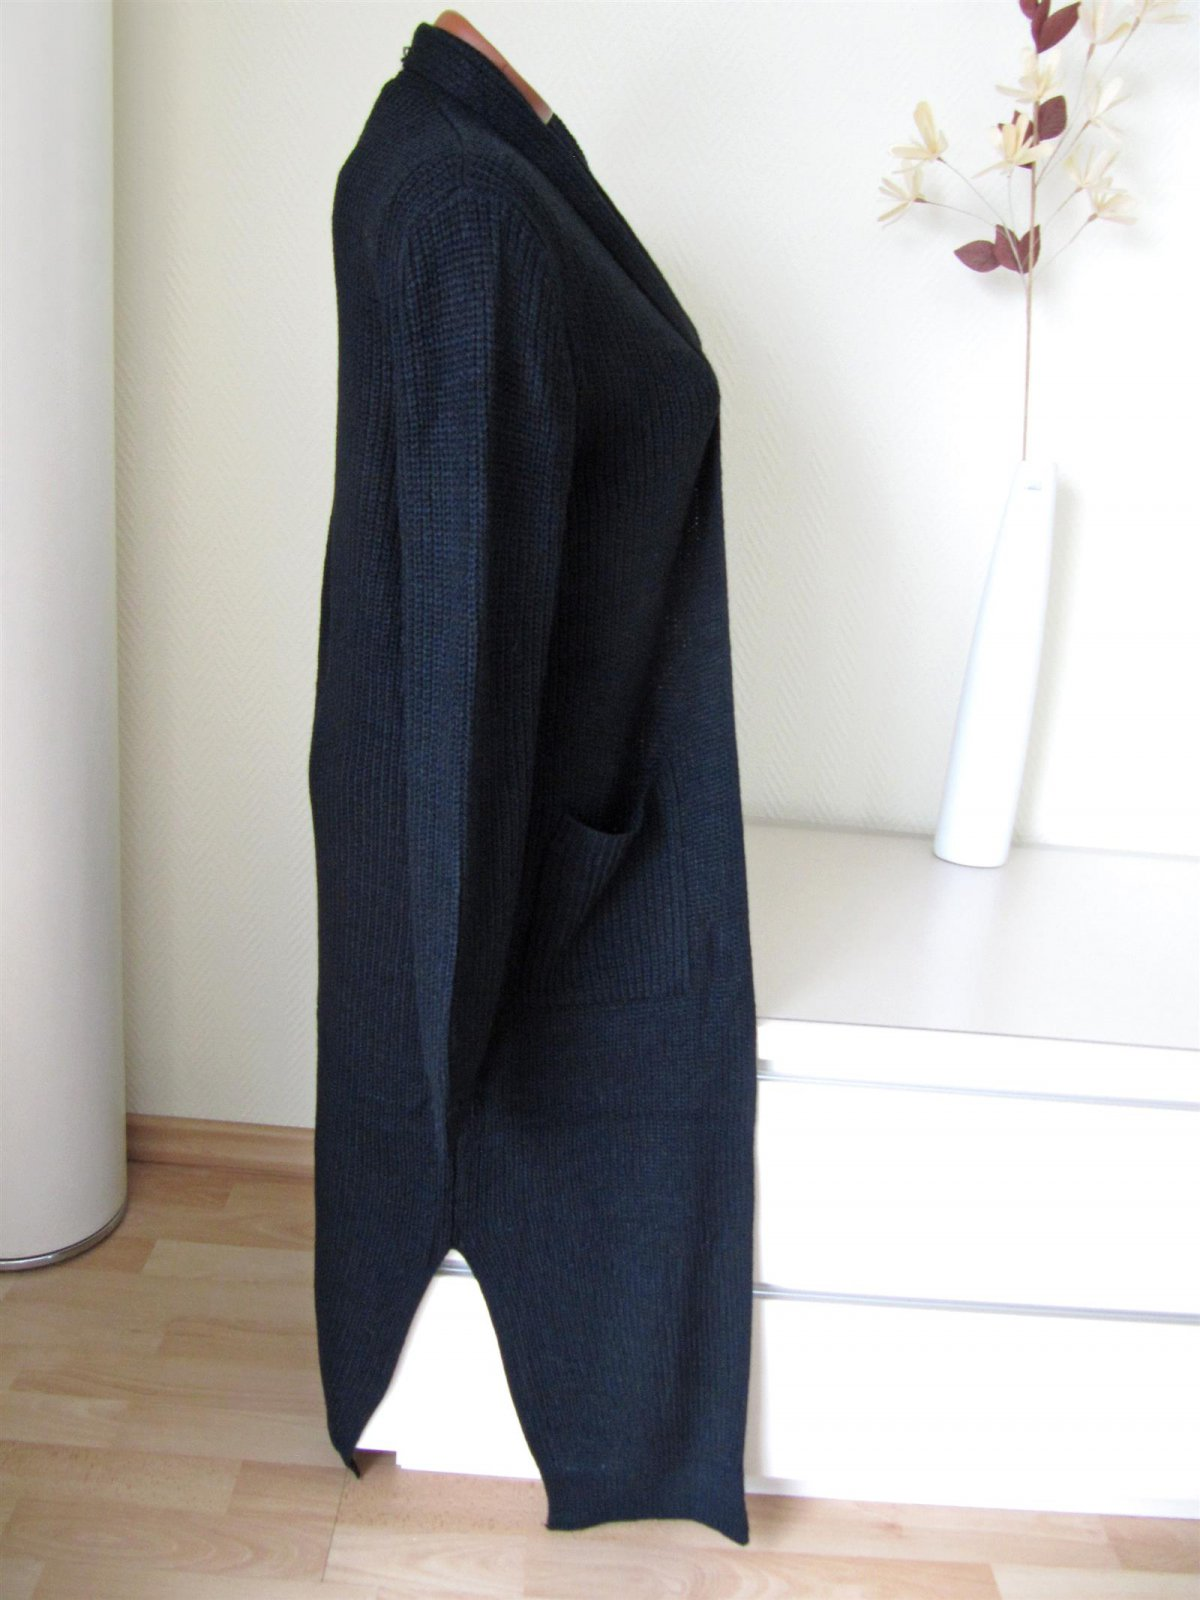 langer maxi strickmantel jacke taschen ohne schmuckndl. Black Bedroom Furniture Sets. Home Design Ideas